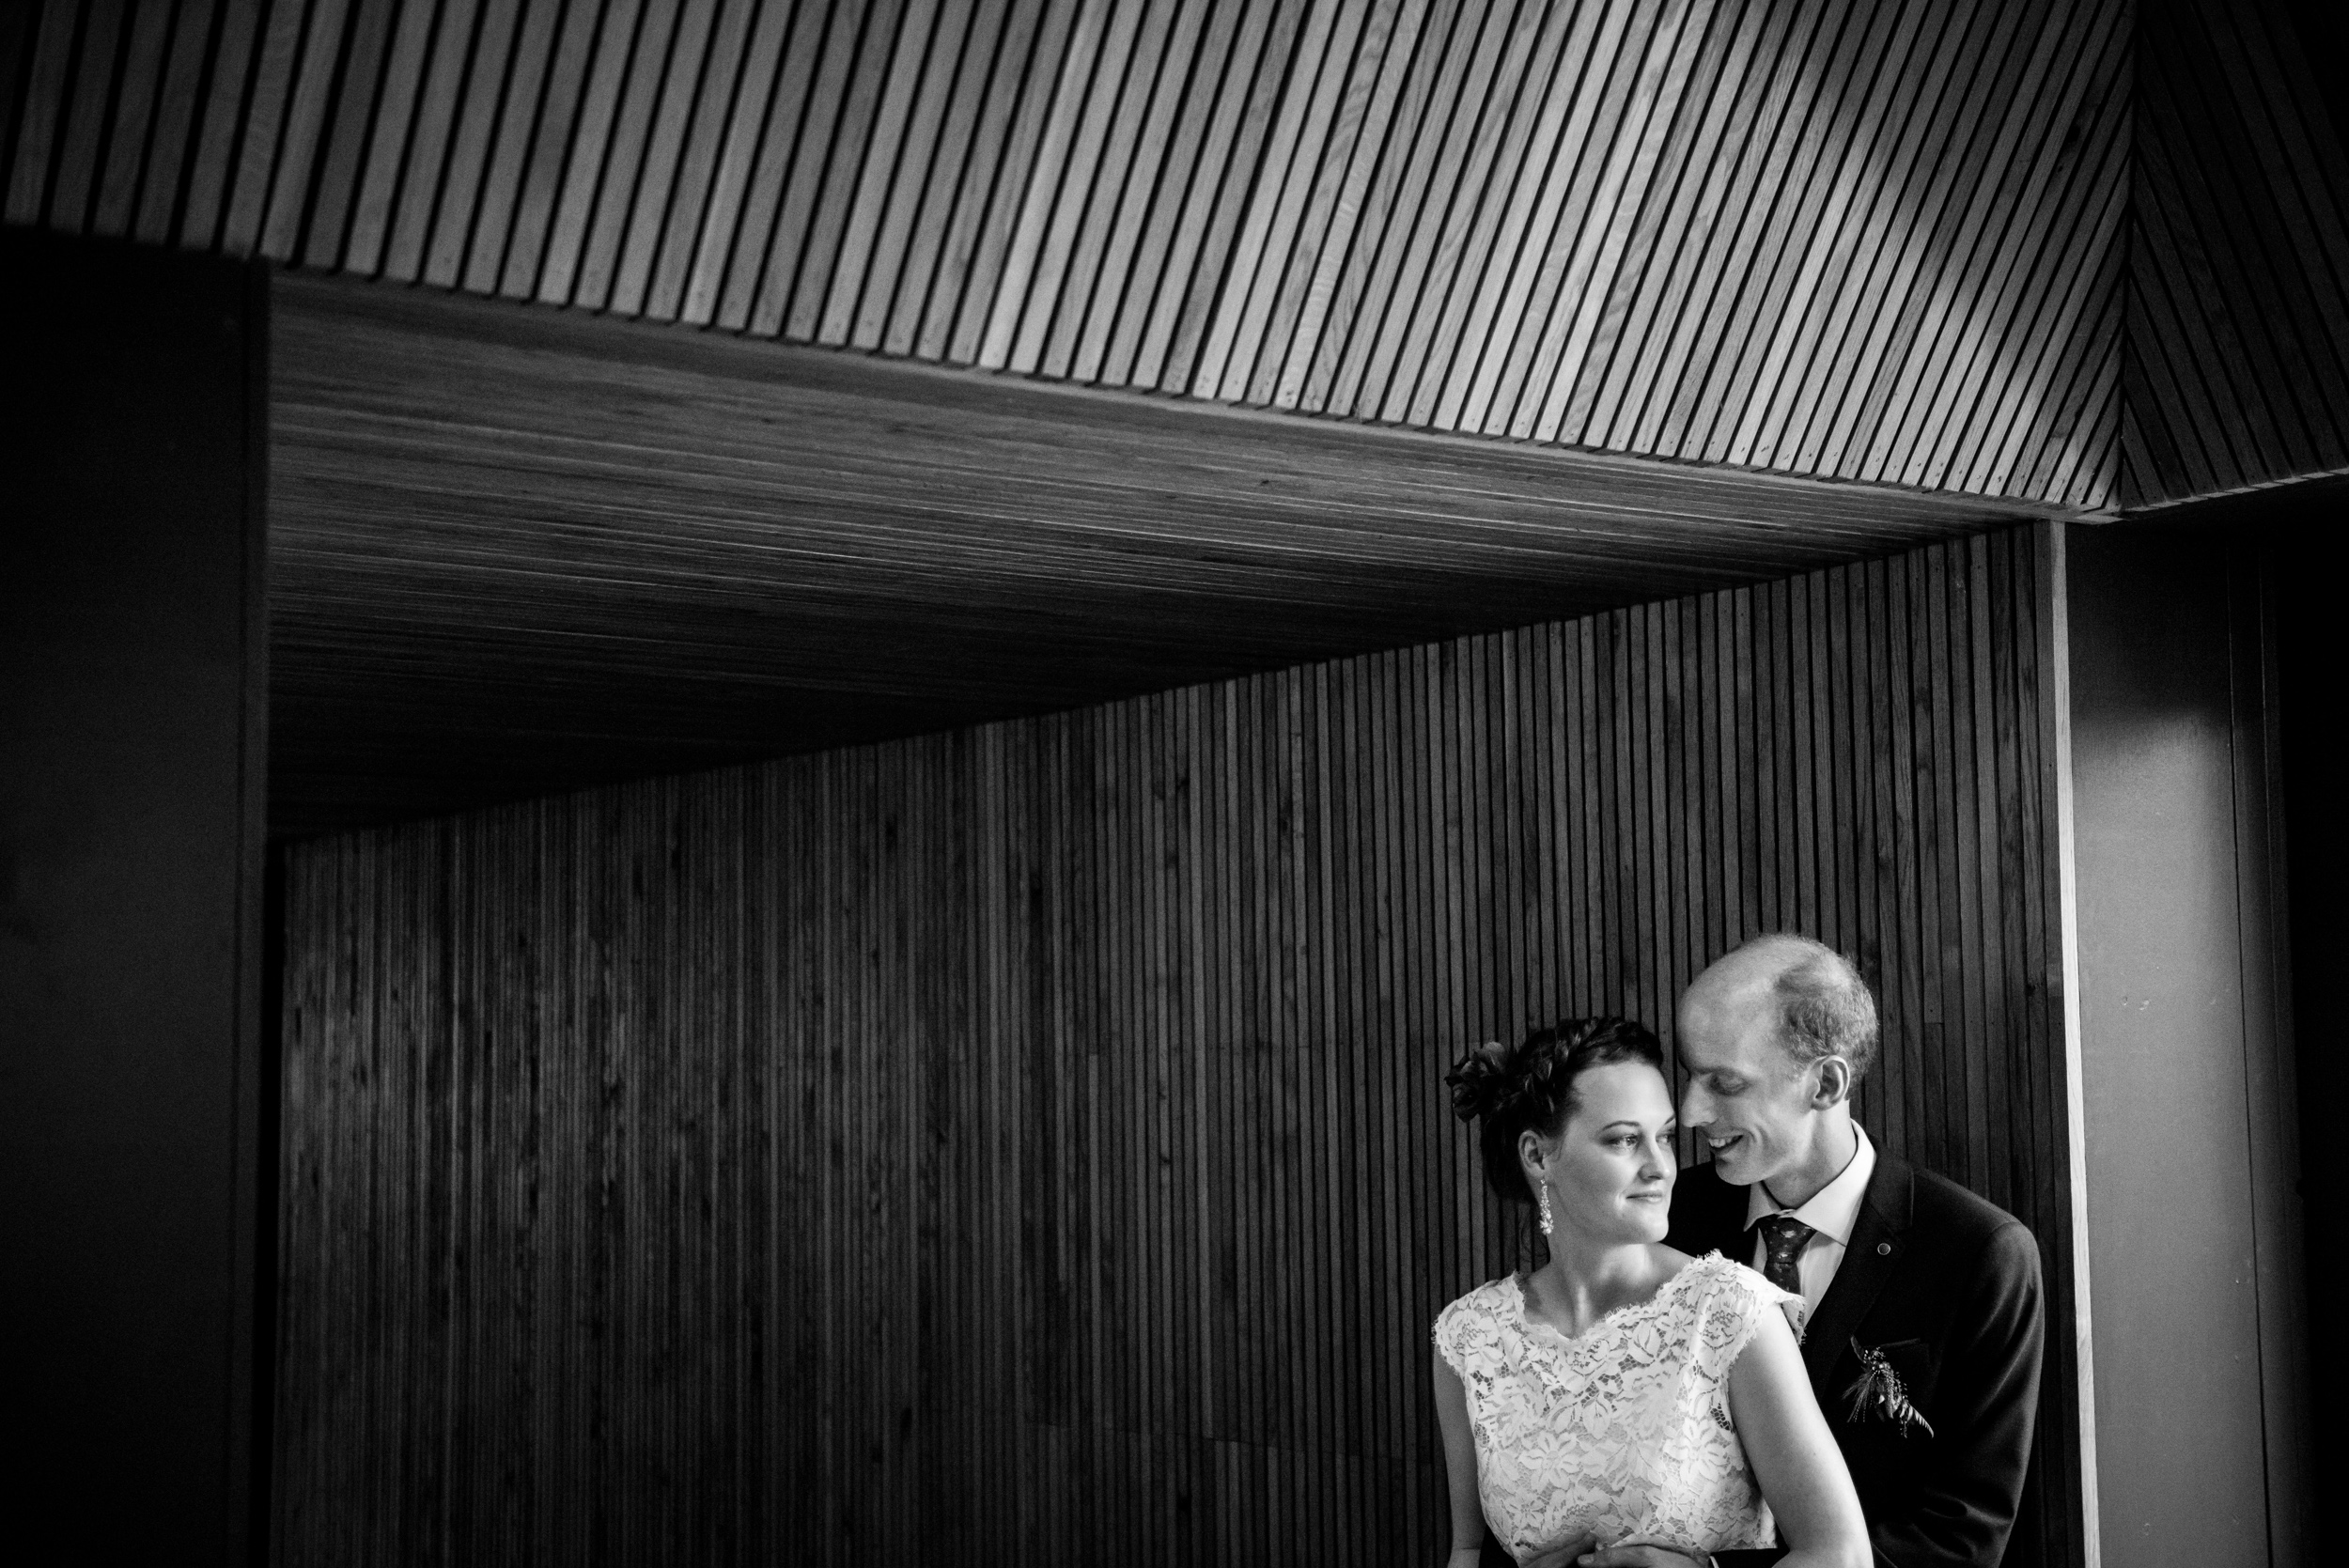 David Scholes Lancashire wedding photography 2016-134.jpg